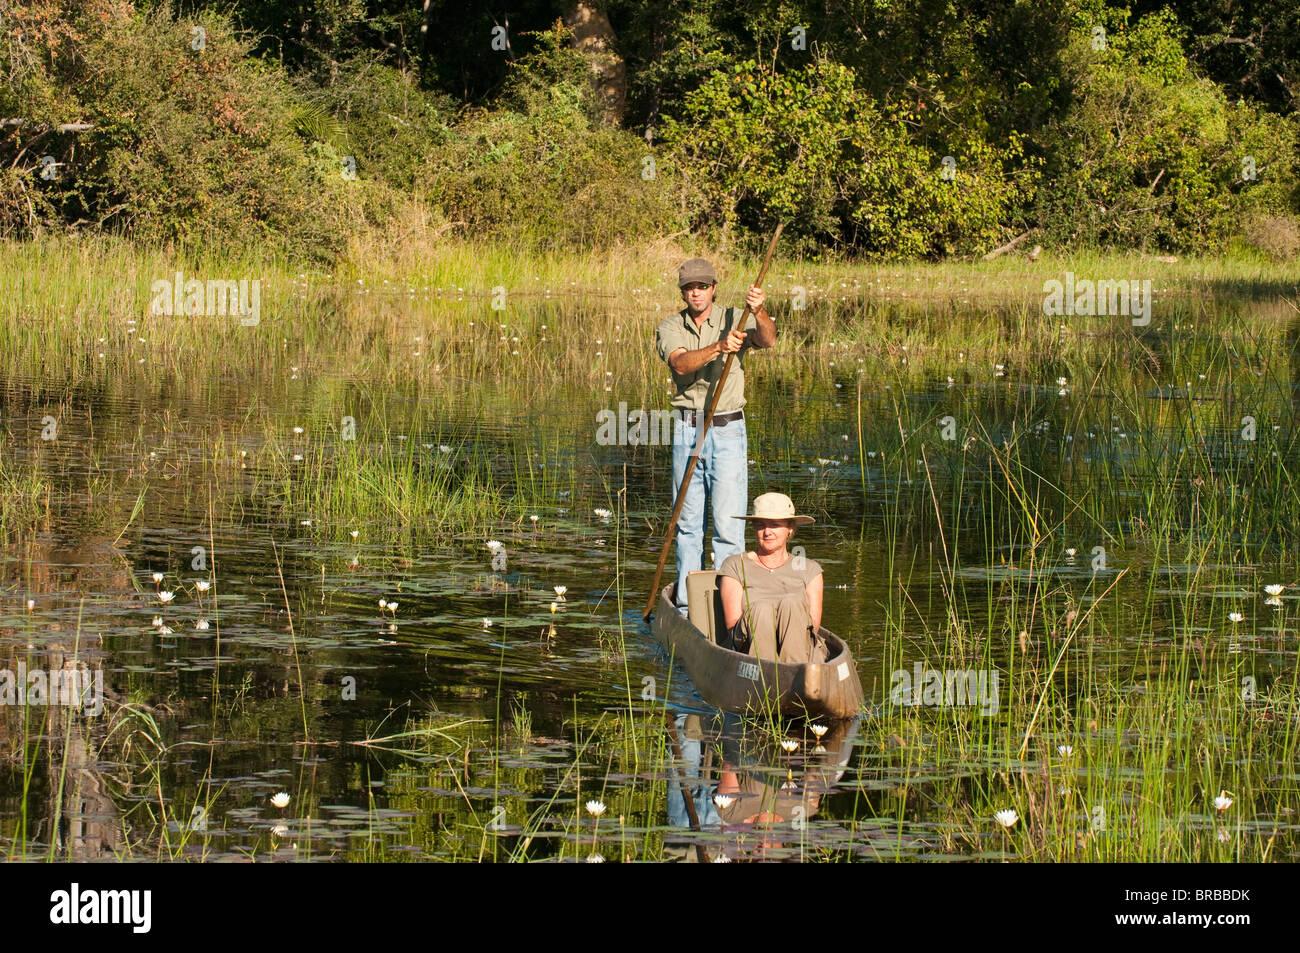 Abu Camp, Okavango Delta, Botswana - Stock Image